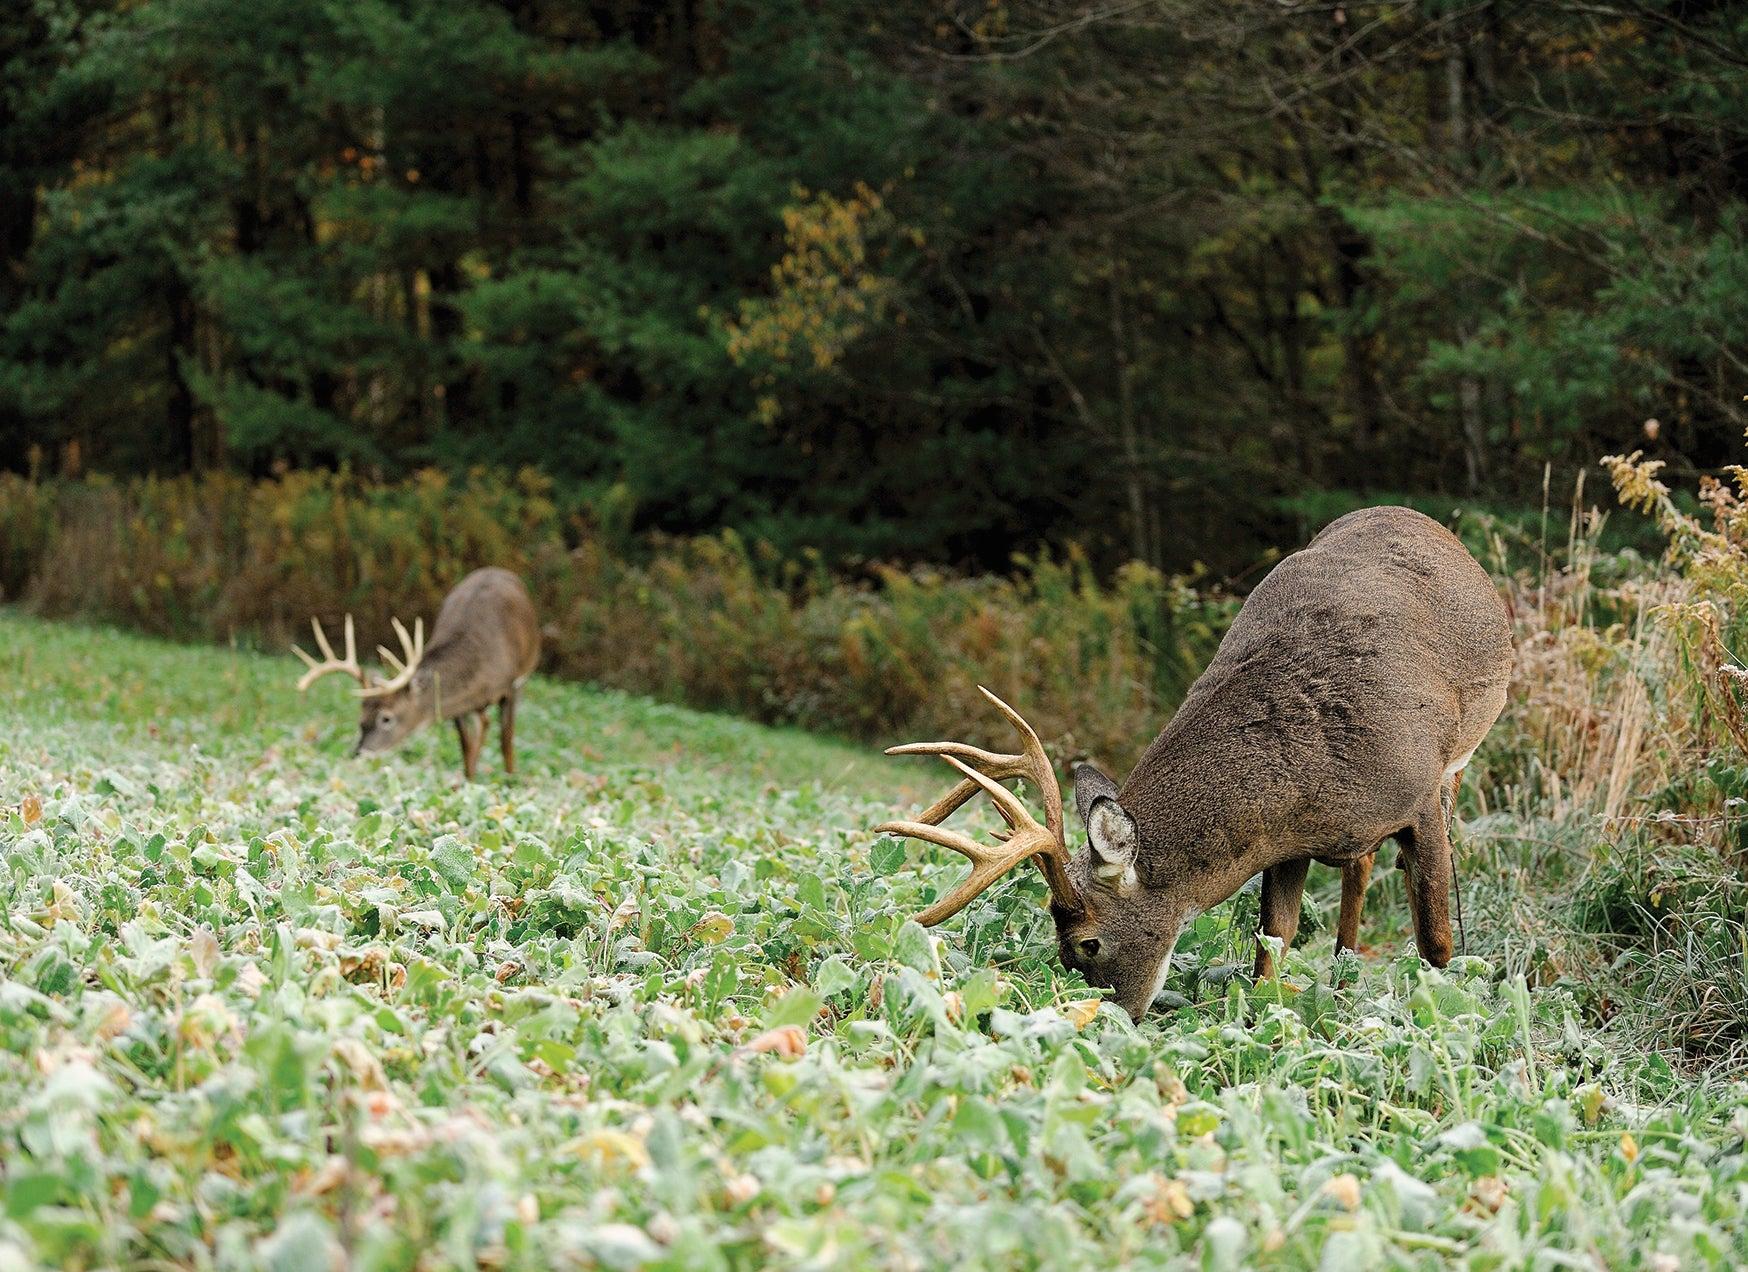 whitetail feeding habits,